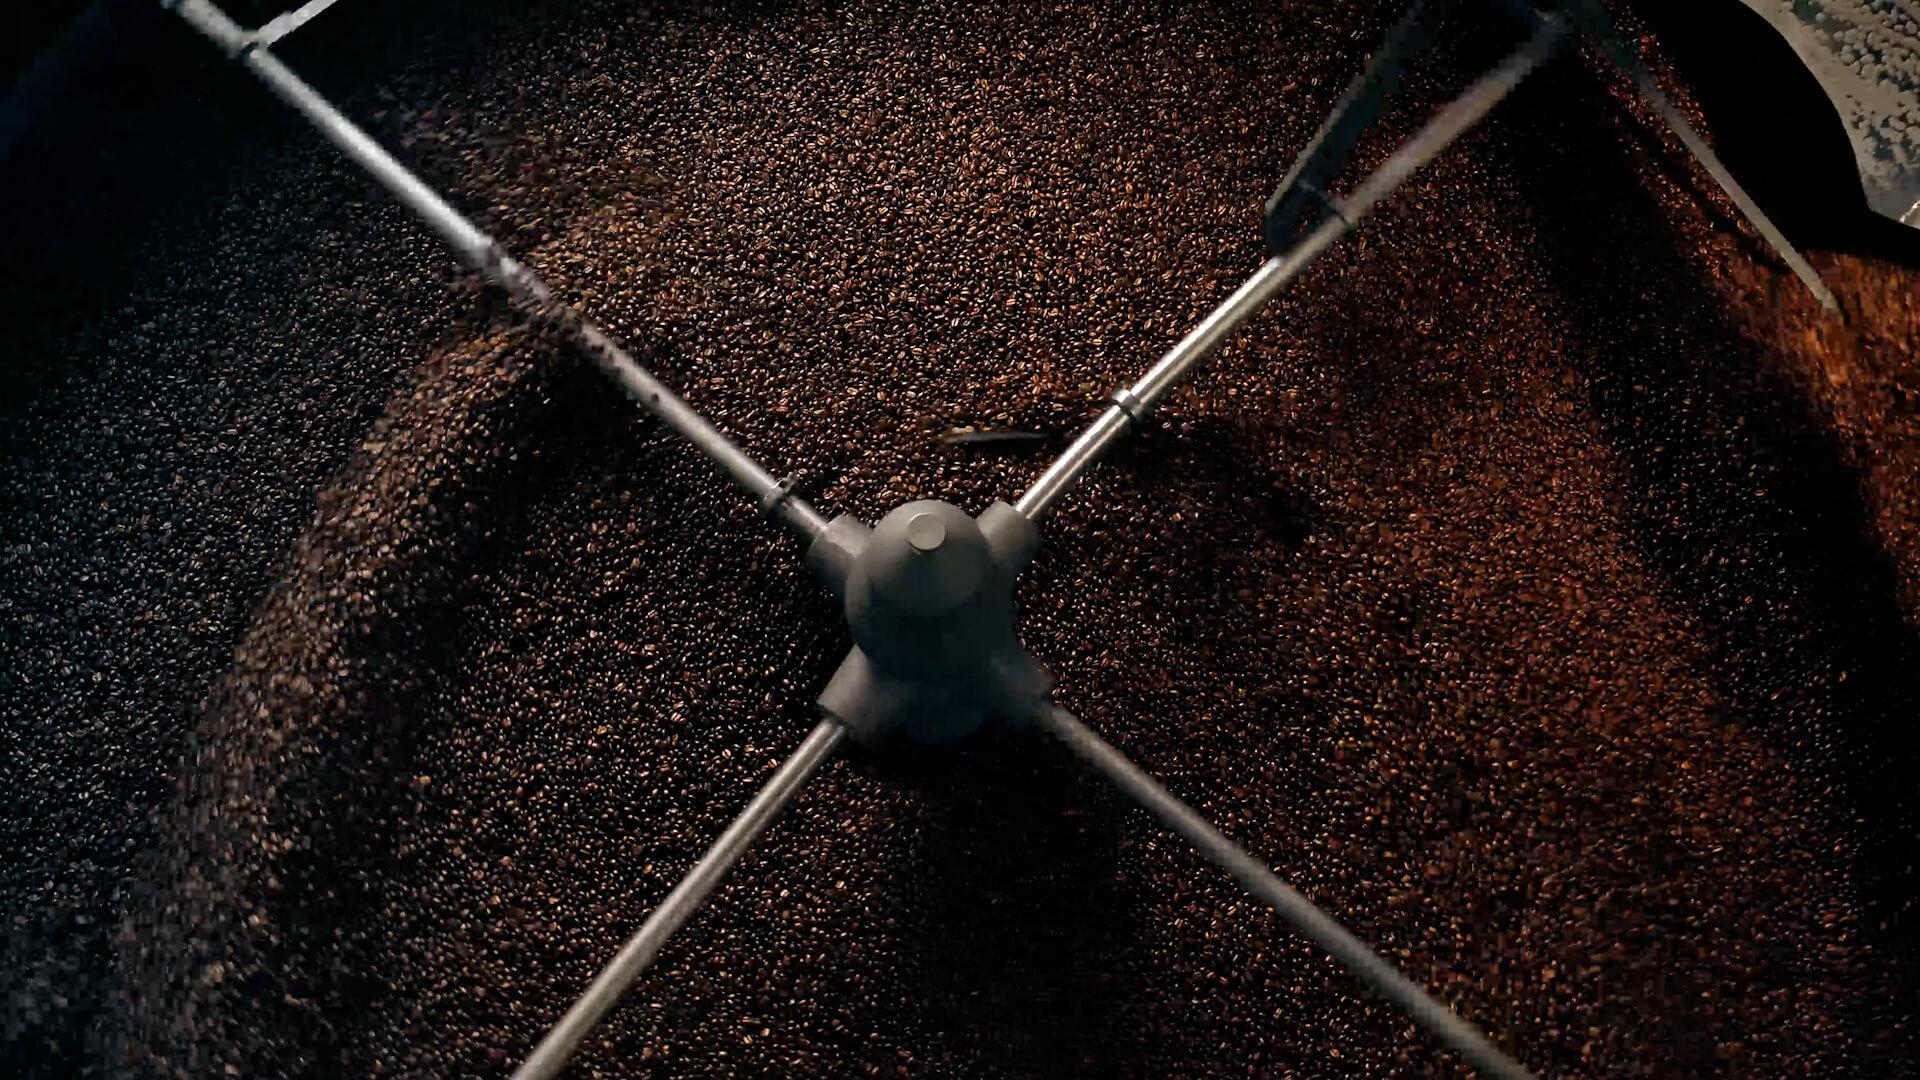 PEET'S COFFEE ROASTED BY HAND